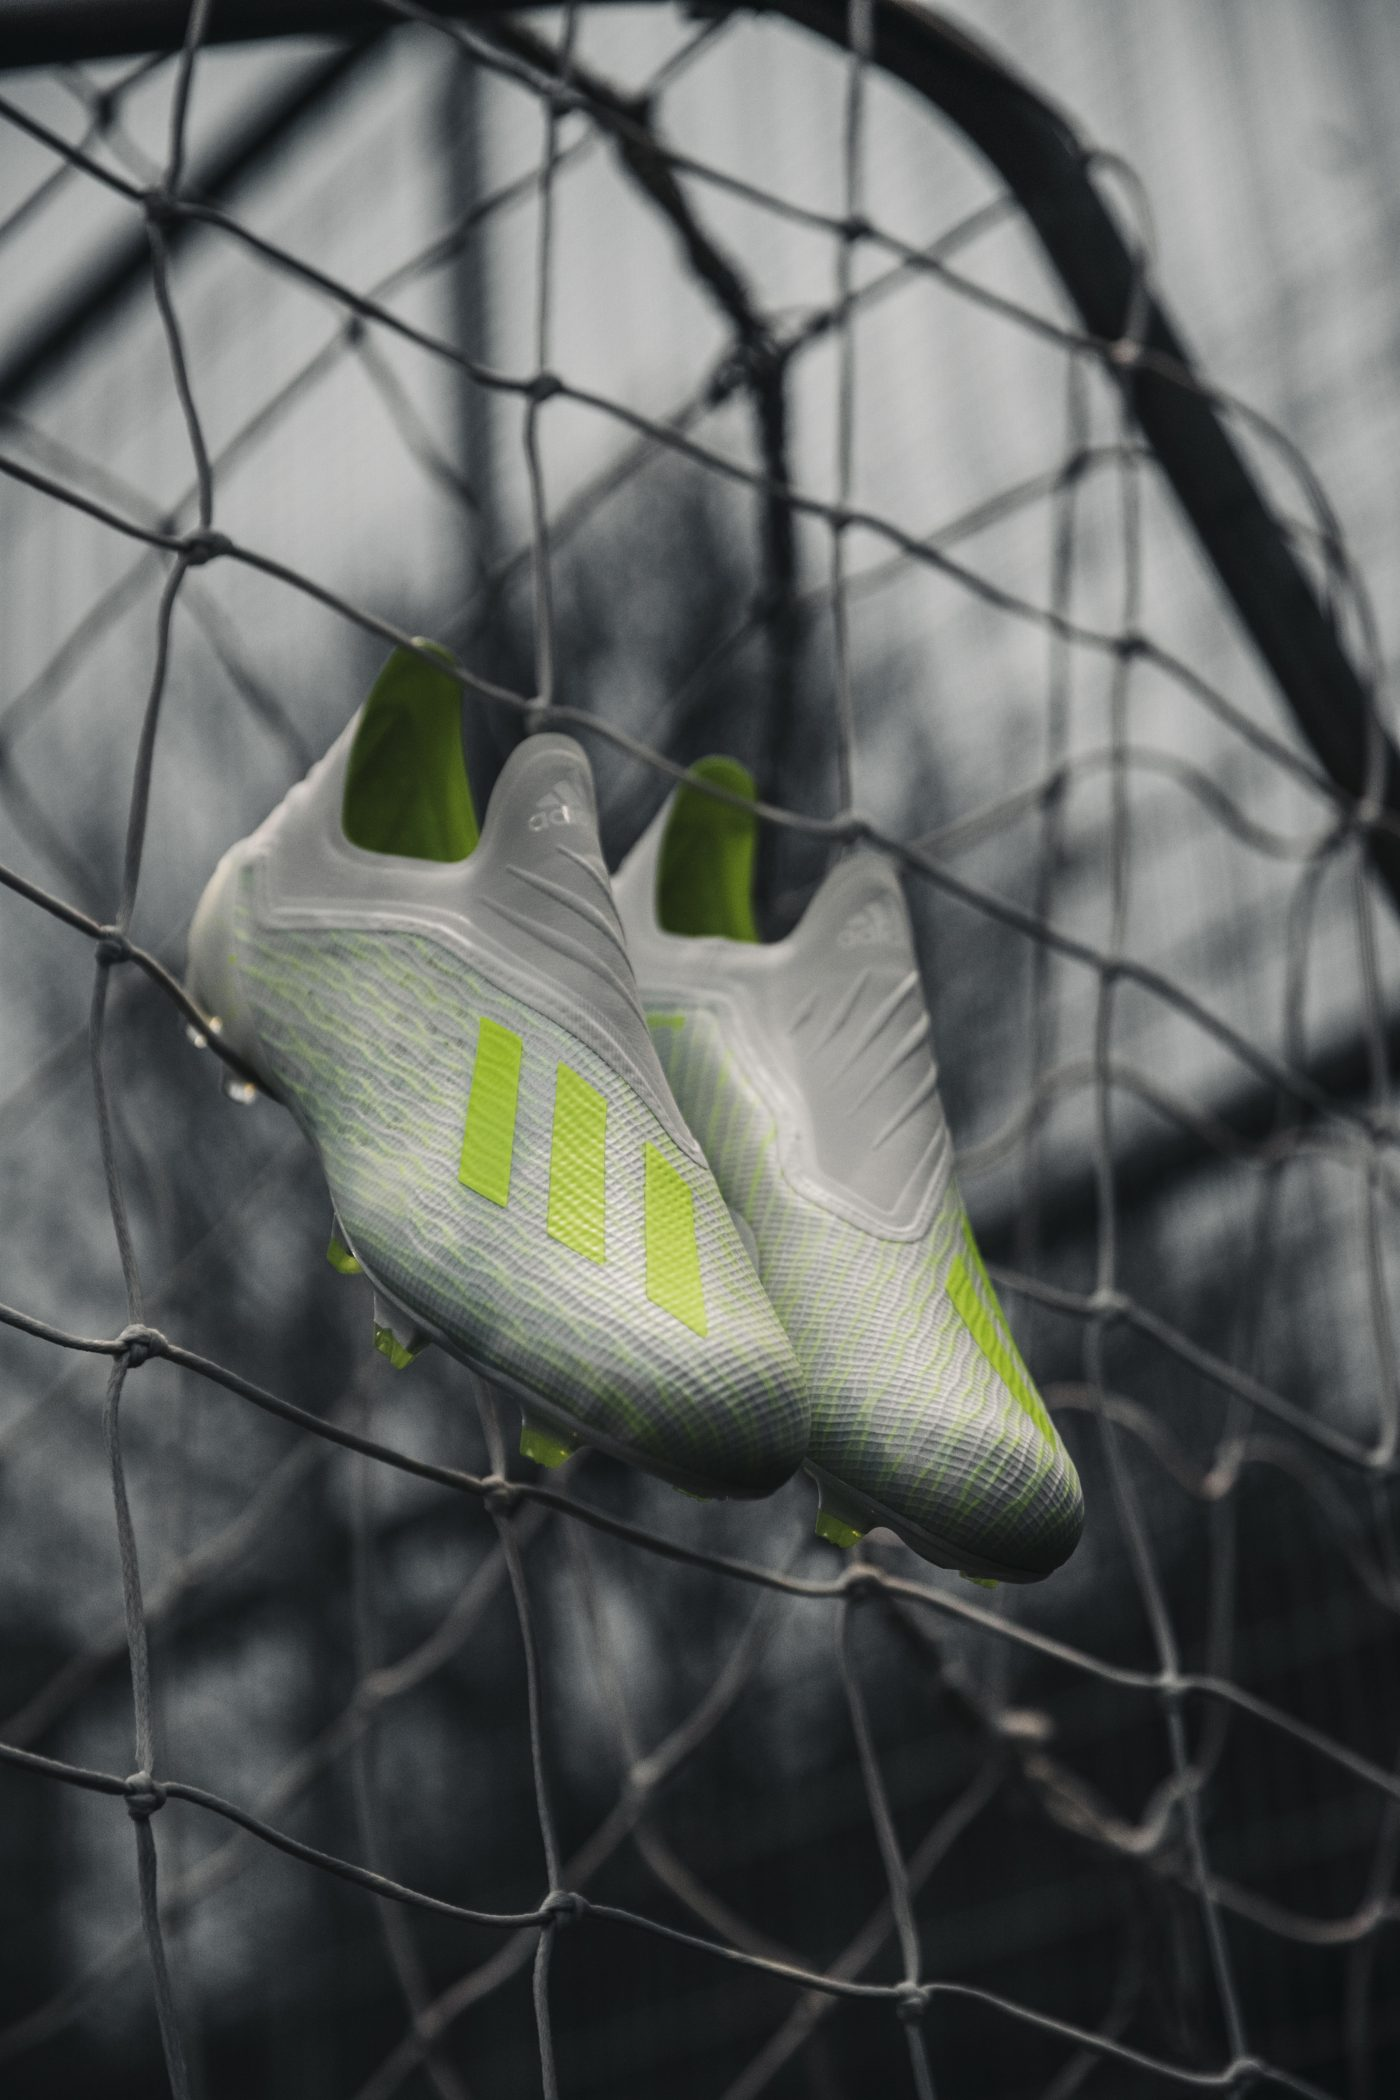 adidas-x-18-pack-virtuso-3